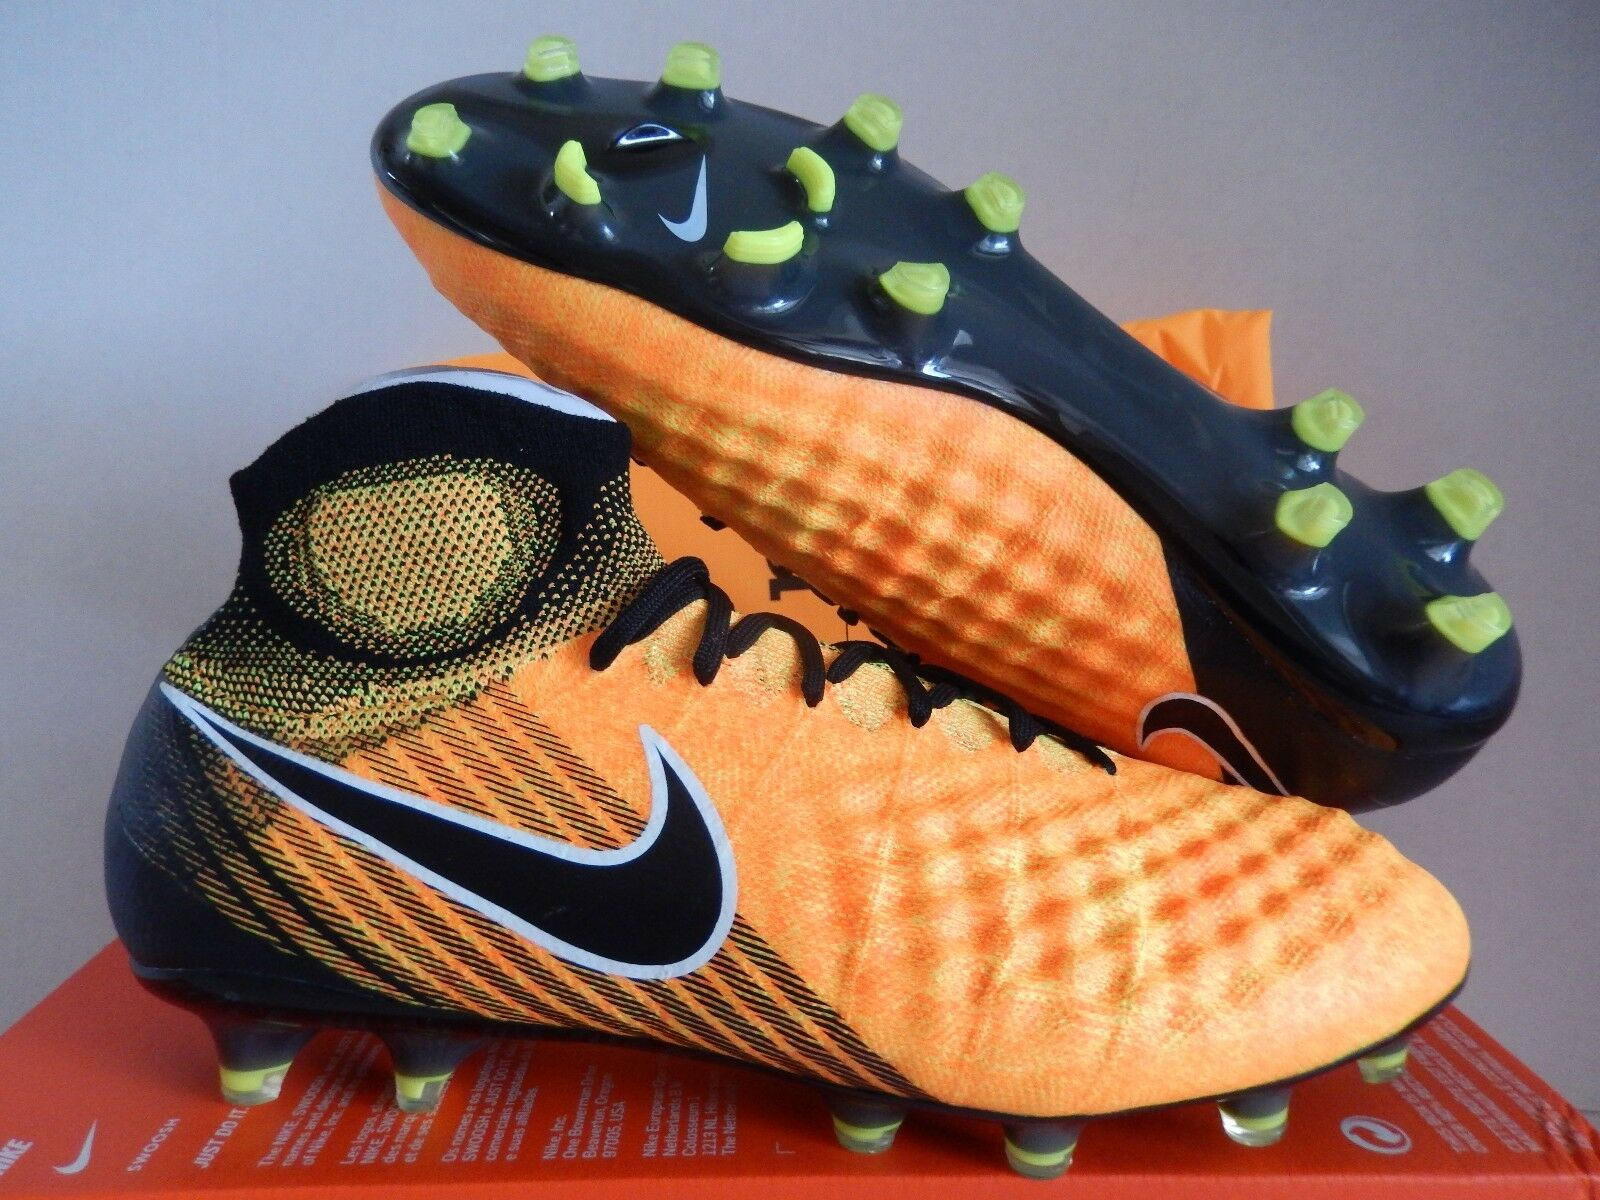 Nike Magista obra II FG Láser Naranja-Negro-blancoo-Volt Talla 7 [844595-801]